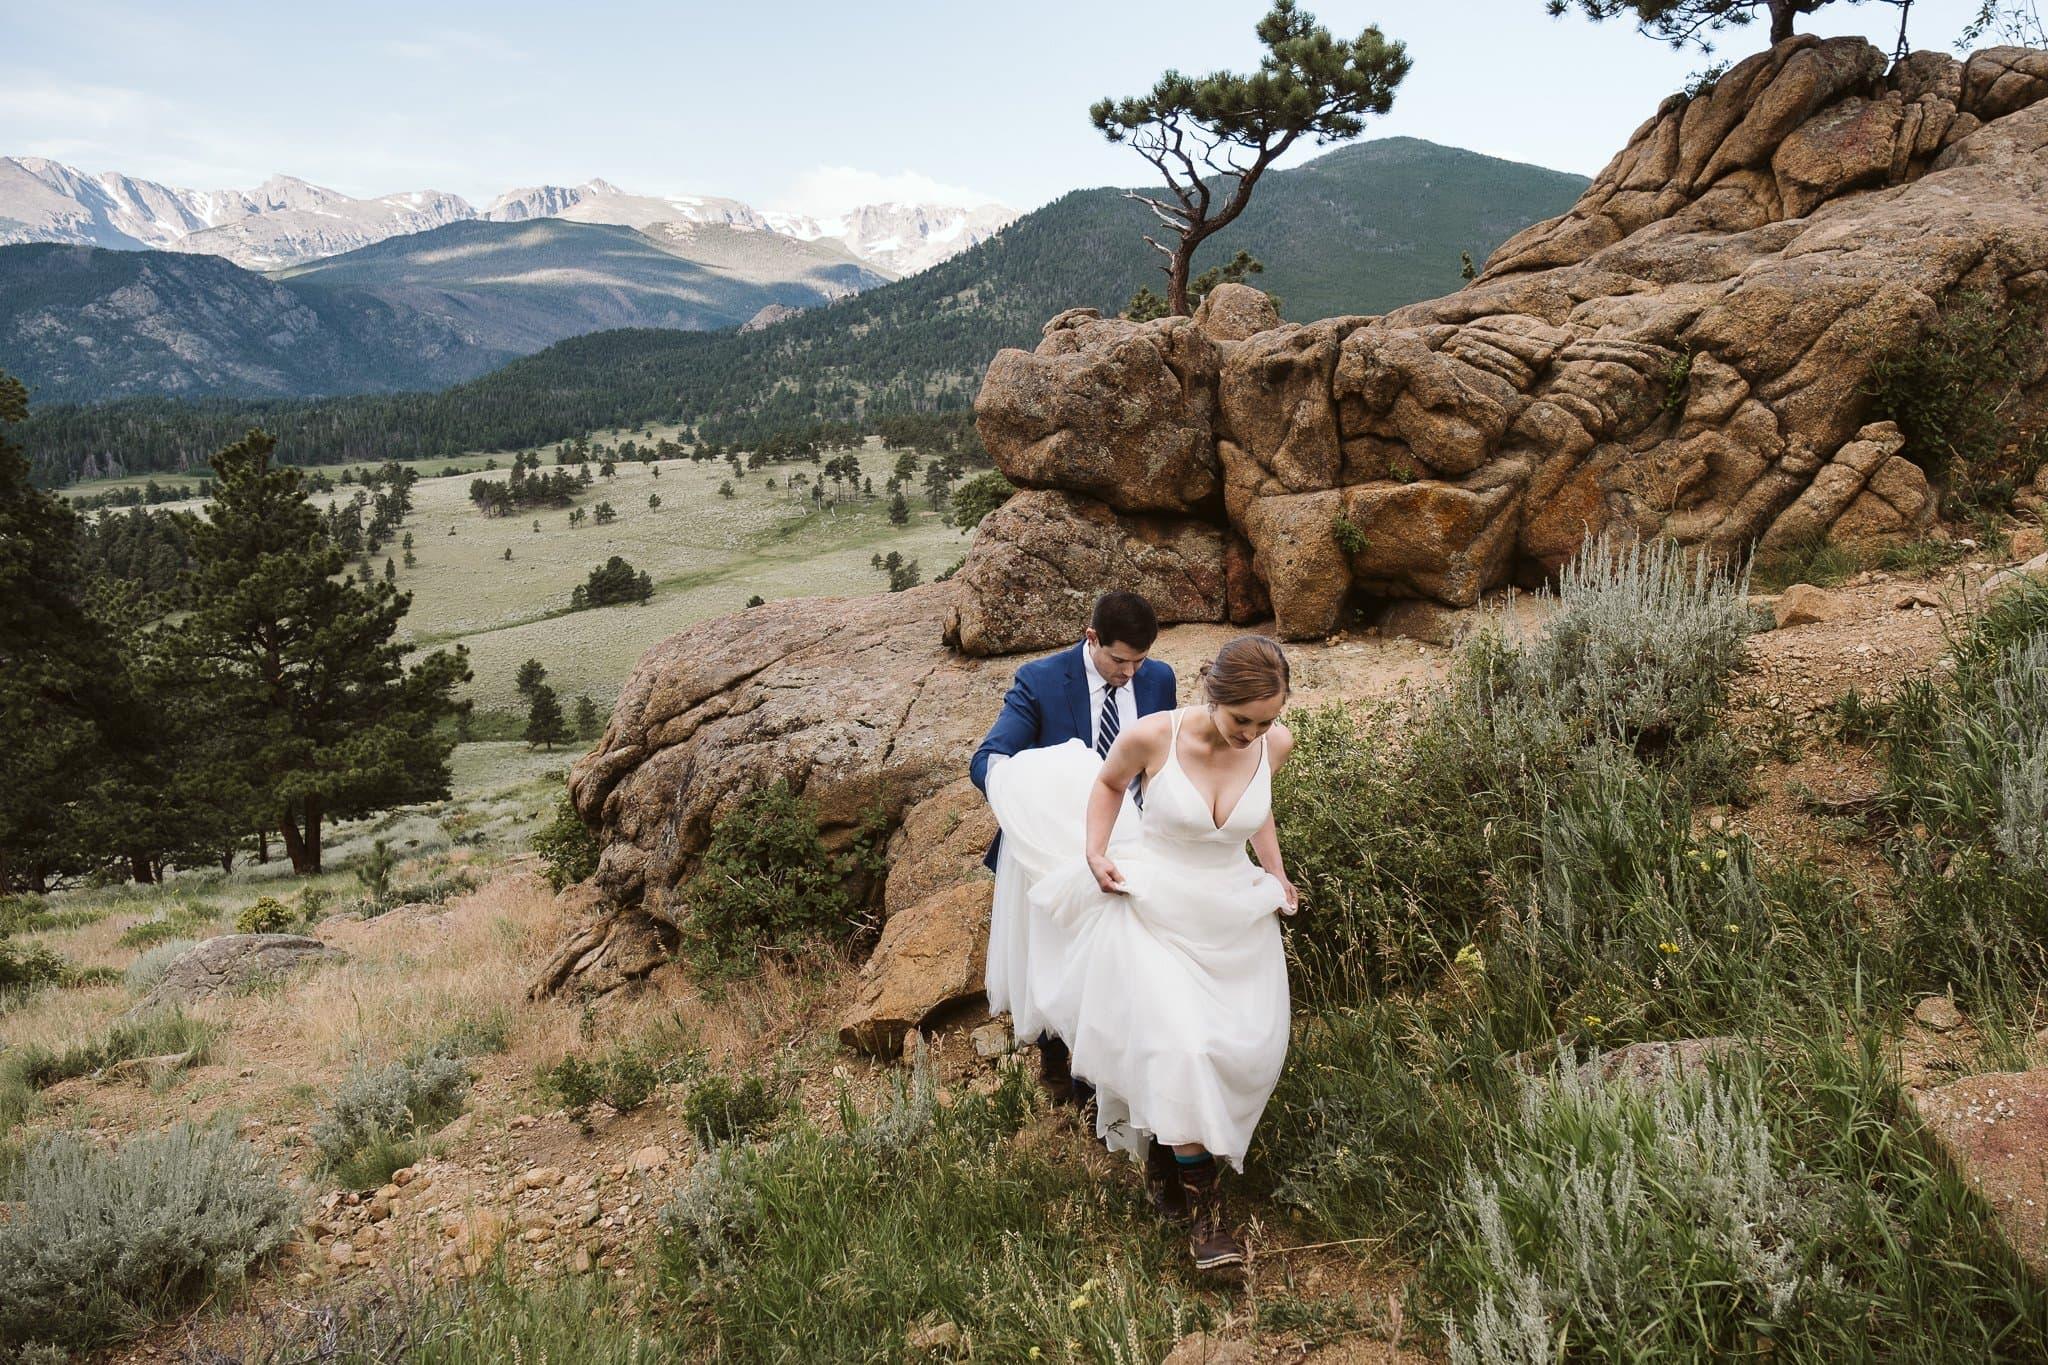 Adventure elopement in Rocky Mountain National Park, Colorado wedding photographer